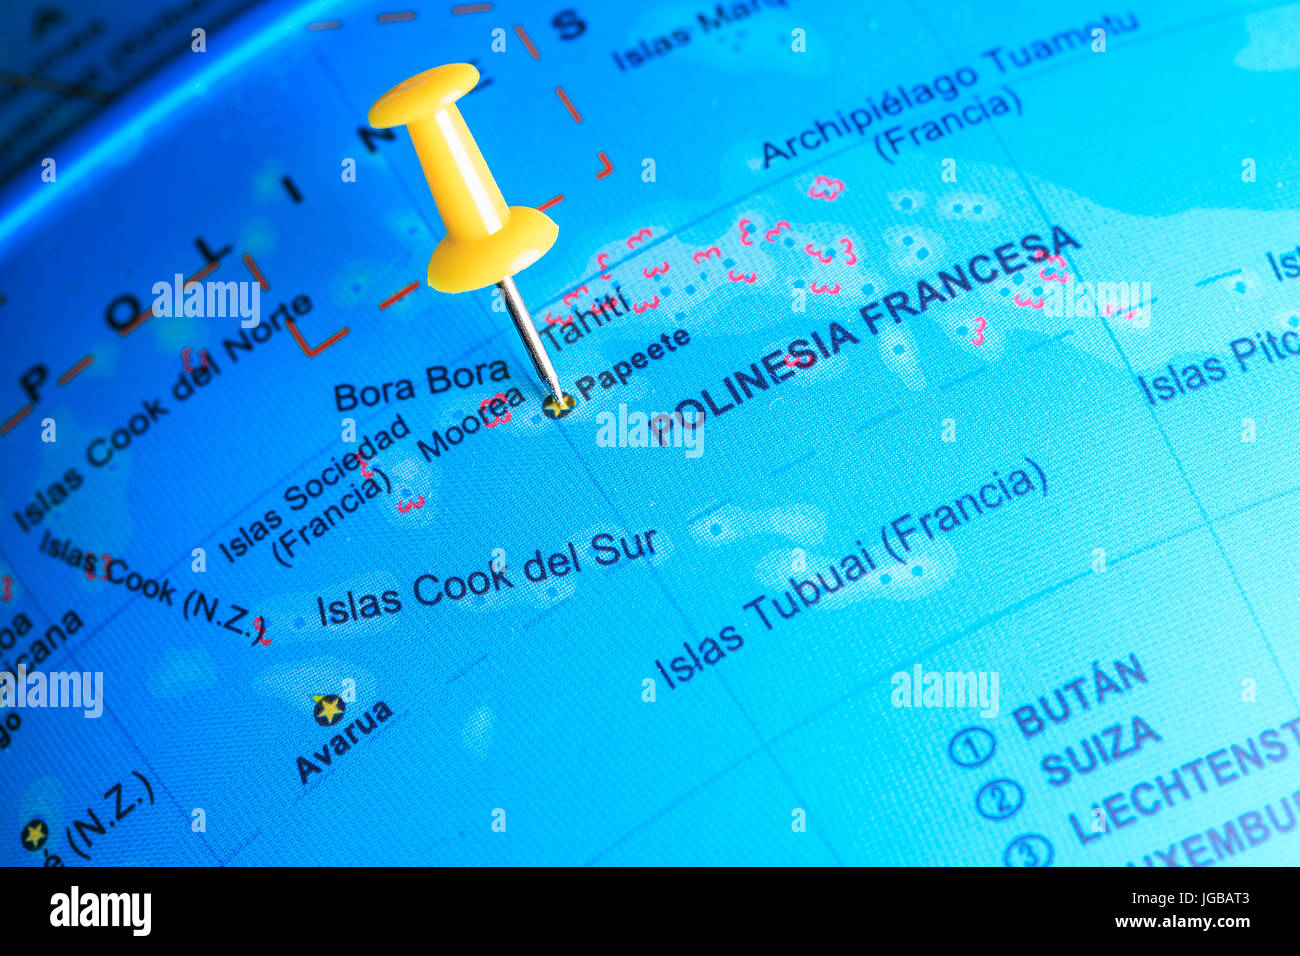 Bora Bora Pinned On A Map Of Oceania Stock Photo 147767427 Alamy